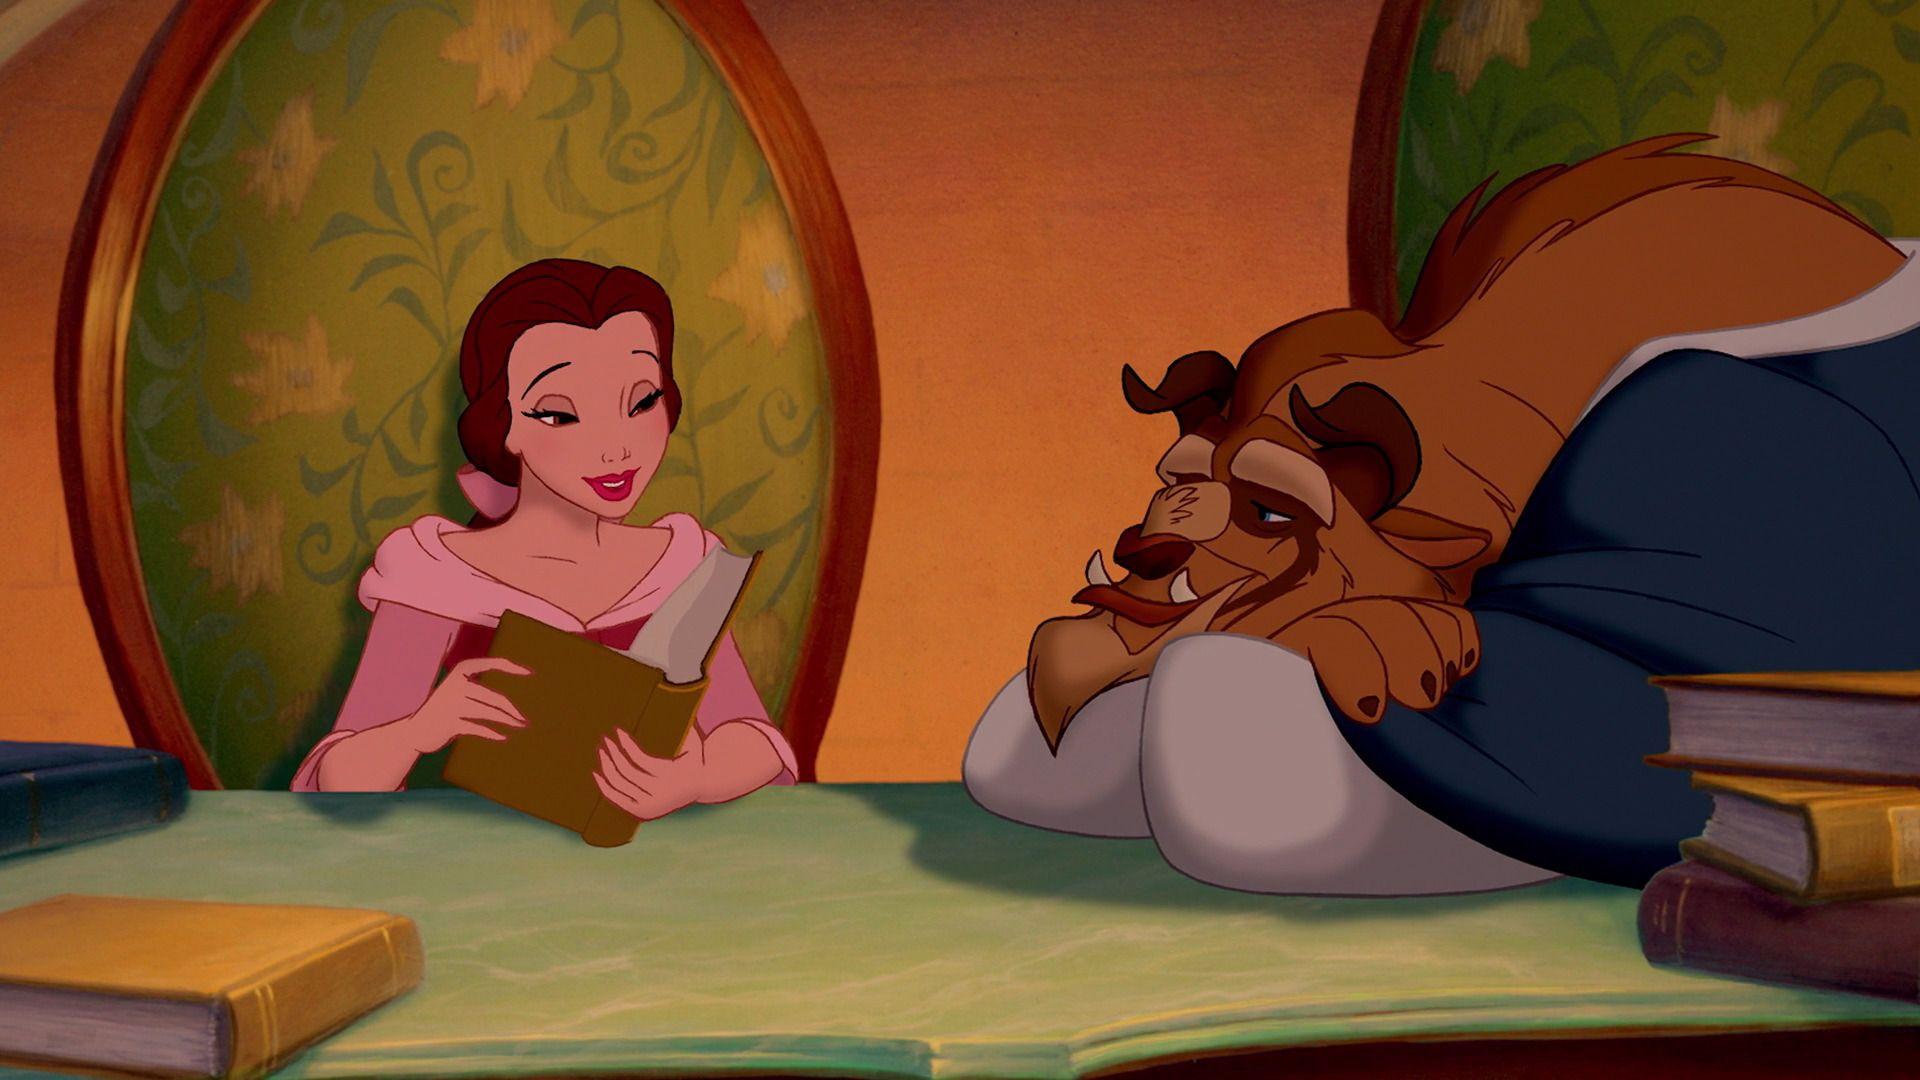 Le Piu Belle Frasi Dei Cartoni Animati.Le Frasi D Amore Piu Belle Dei Cartoni Animati Disney Bigodino